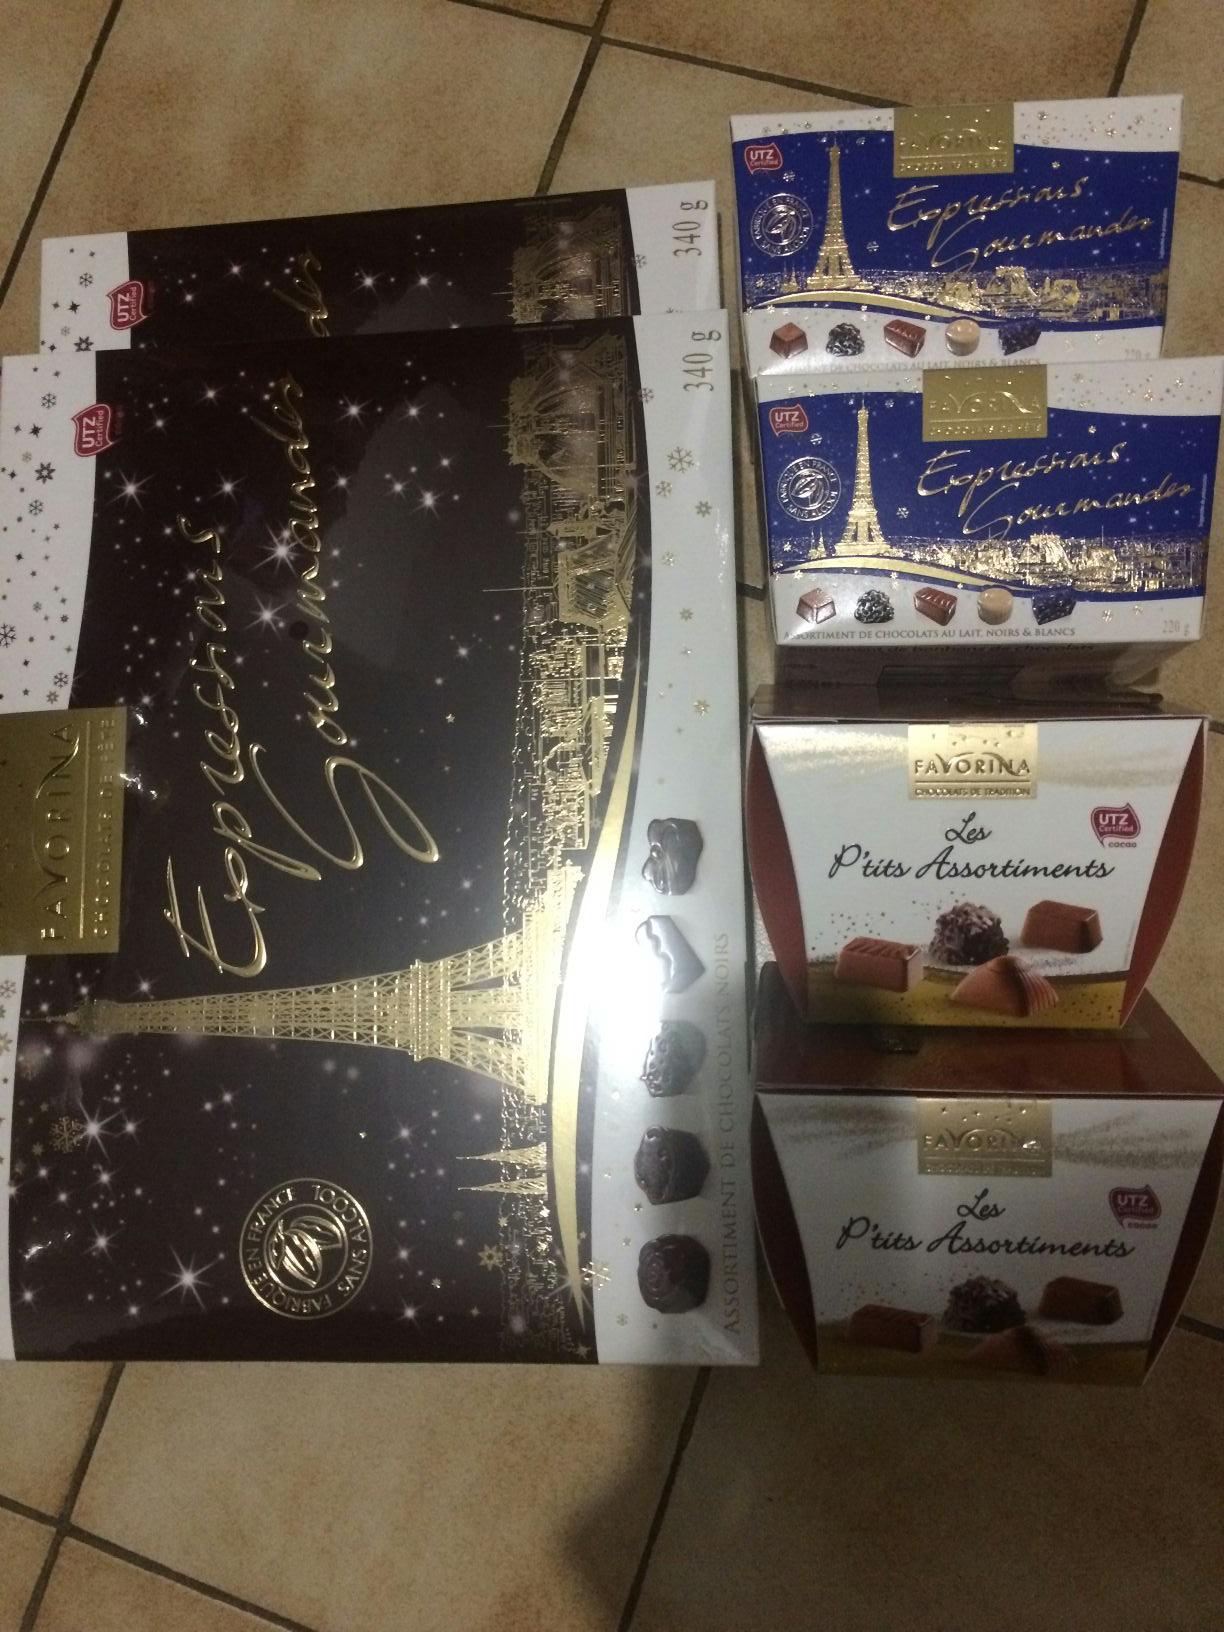 Assortiments de Chocolats Favorina - Béziers (34)